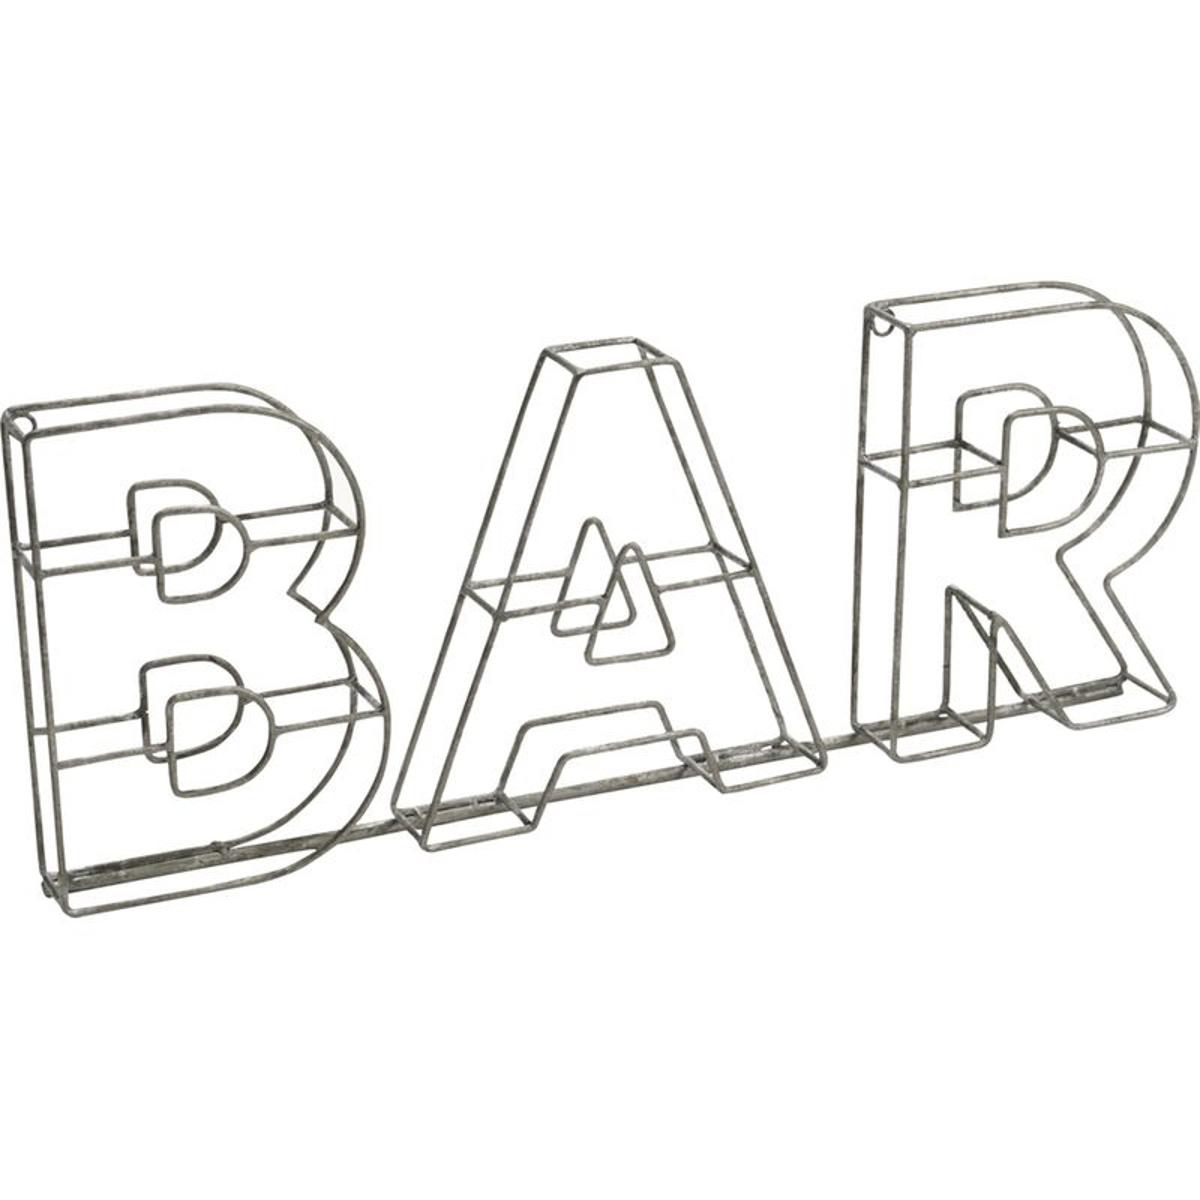 Decor mural métal Bar